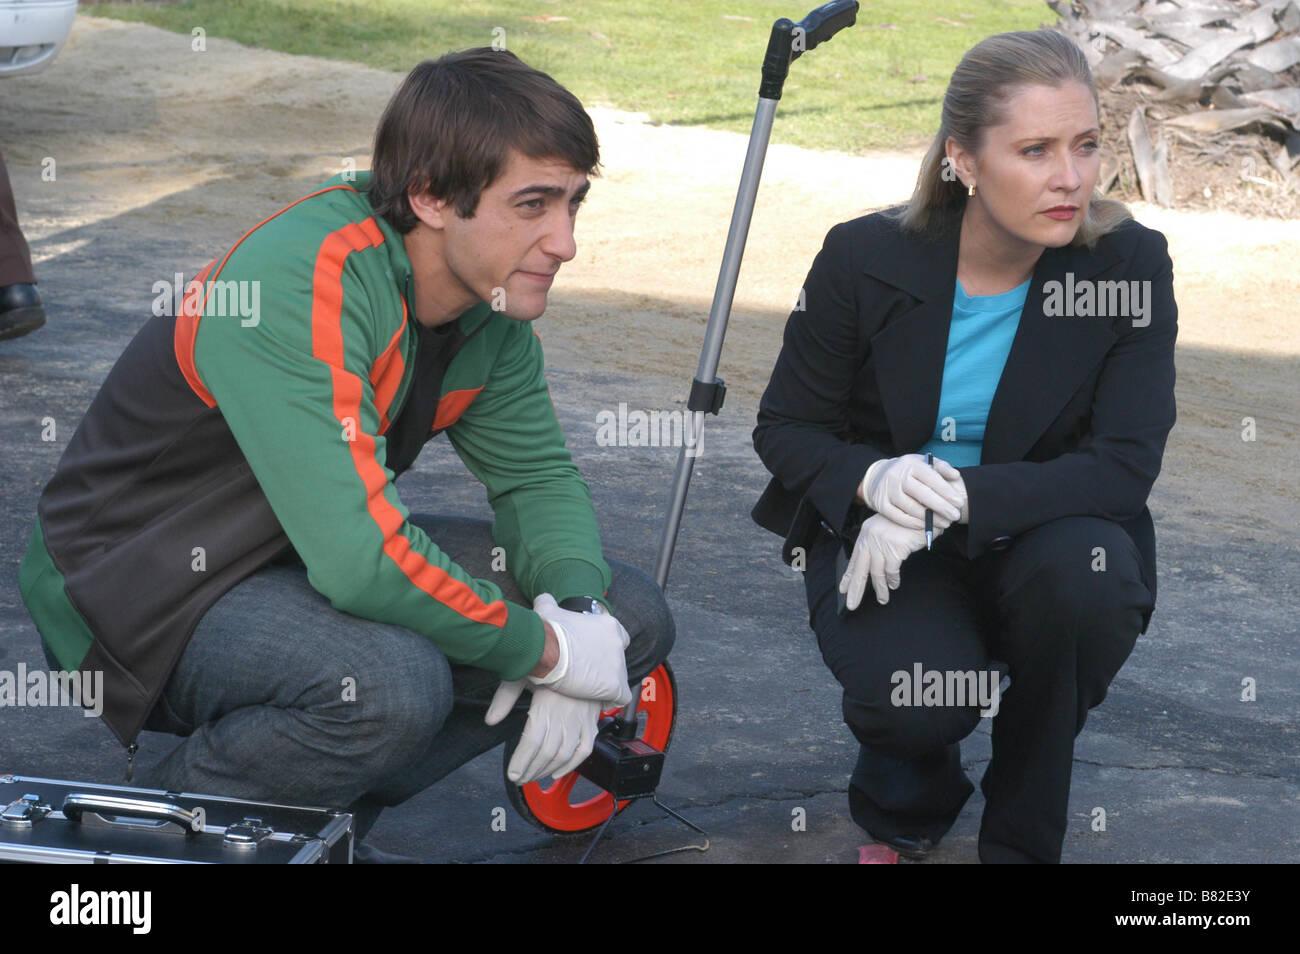 CSI: Miami  TV Series 2002-???? 2002 Season 1 - Ashes to Ashes Emily Procter, Jonathan Togo  Director: Bryan Spicer - Stock Image